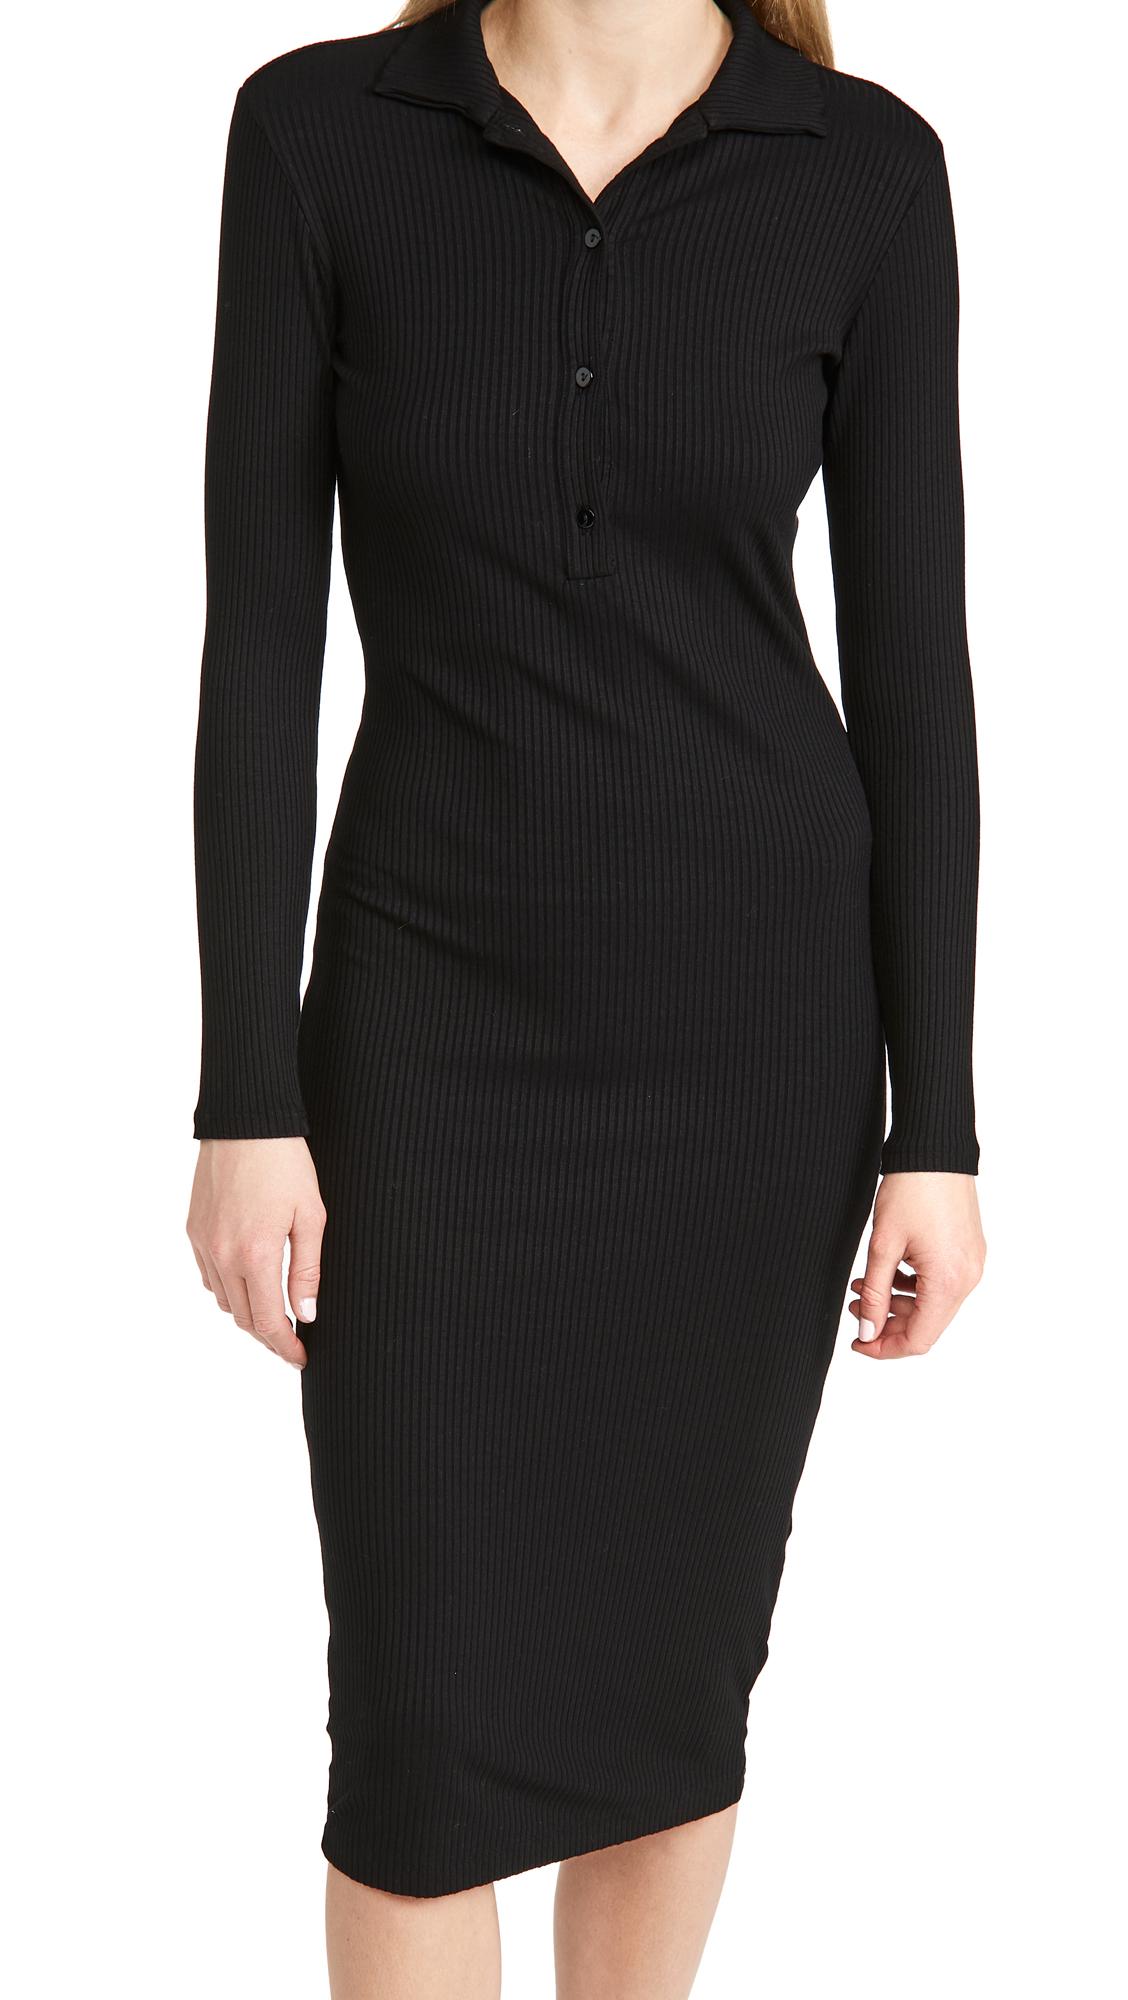 Enza Costa Viscose Rib Knee Length Polo Dress